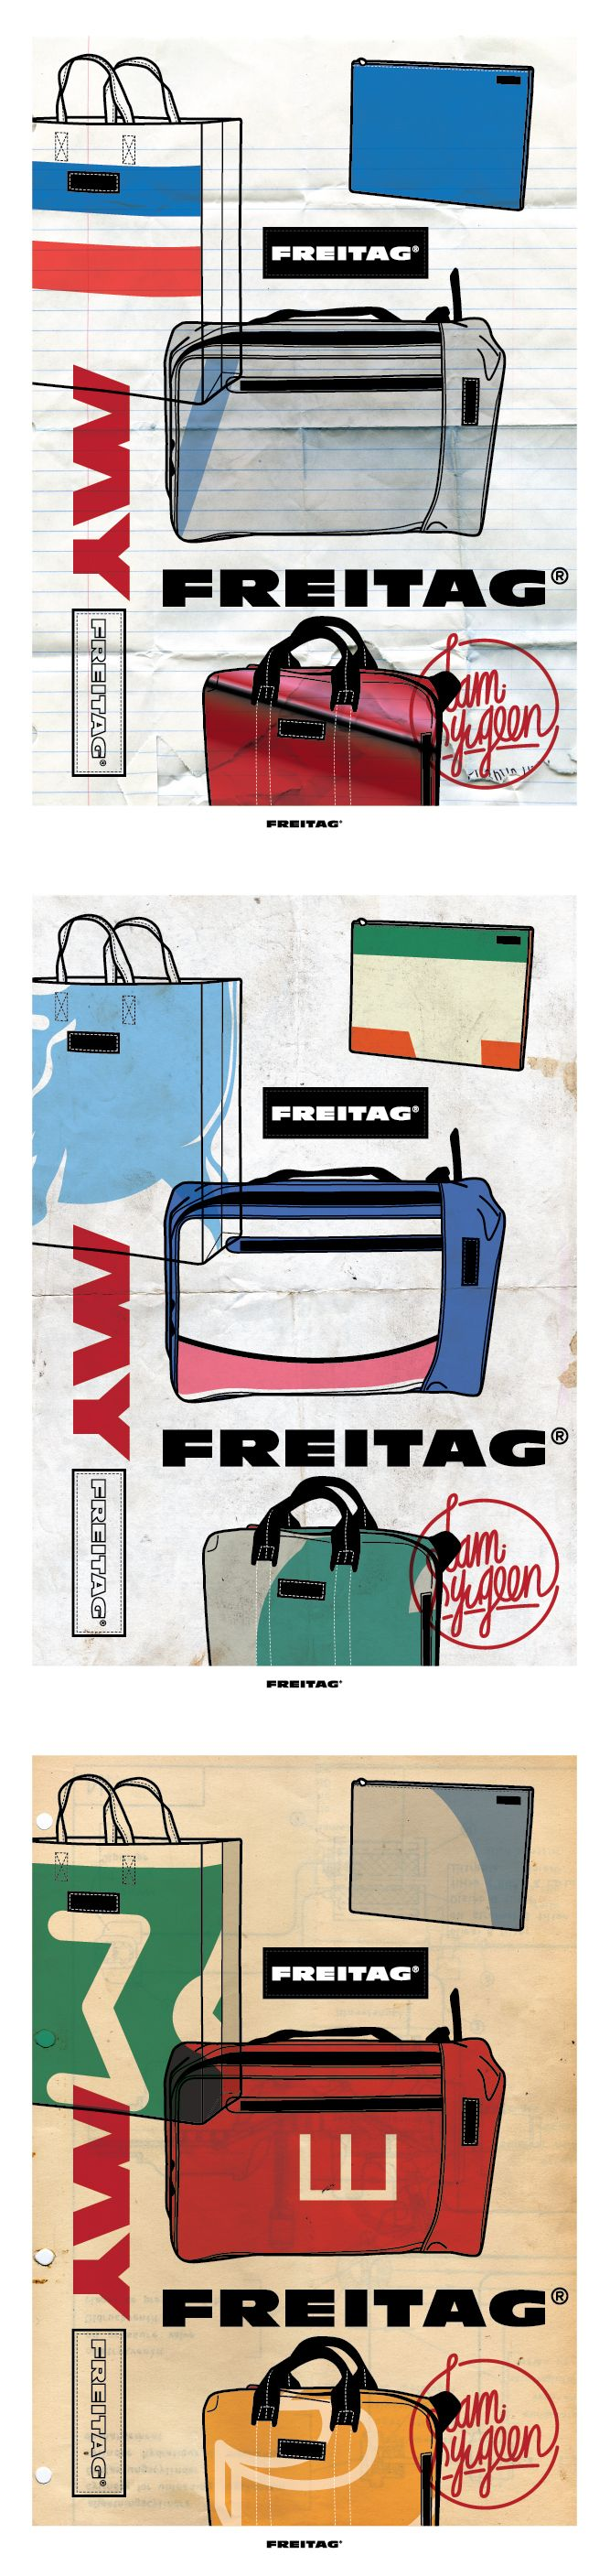 'My Freitag' Designed by Ryugoon.